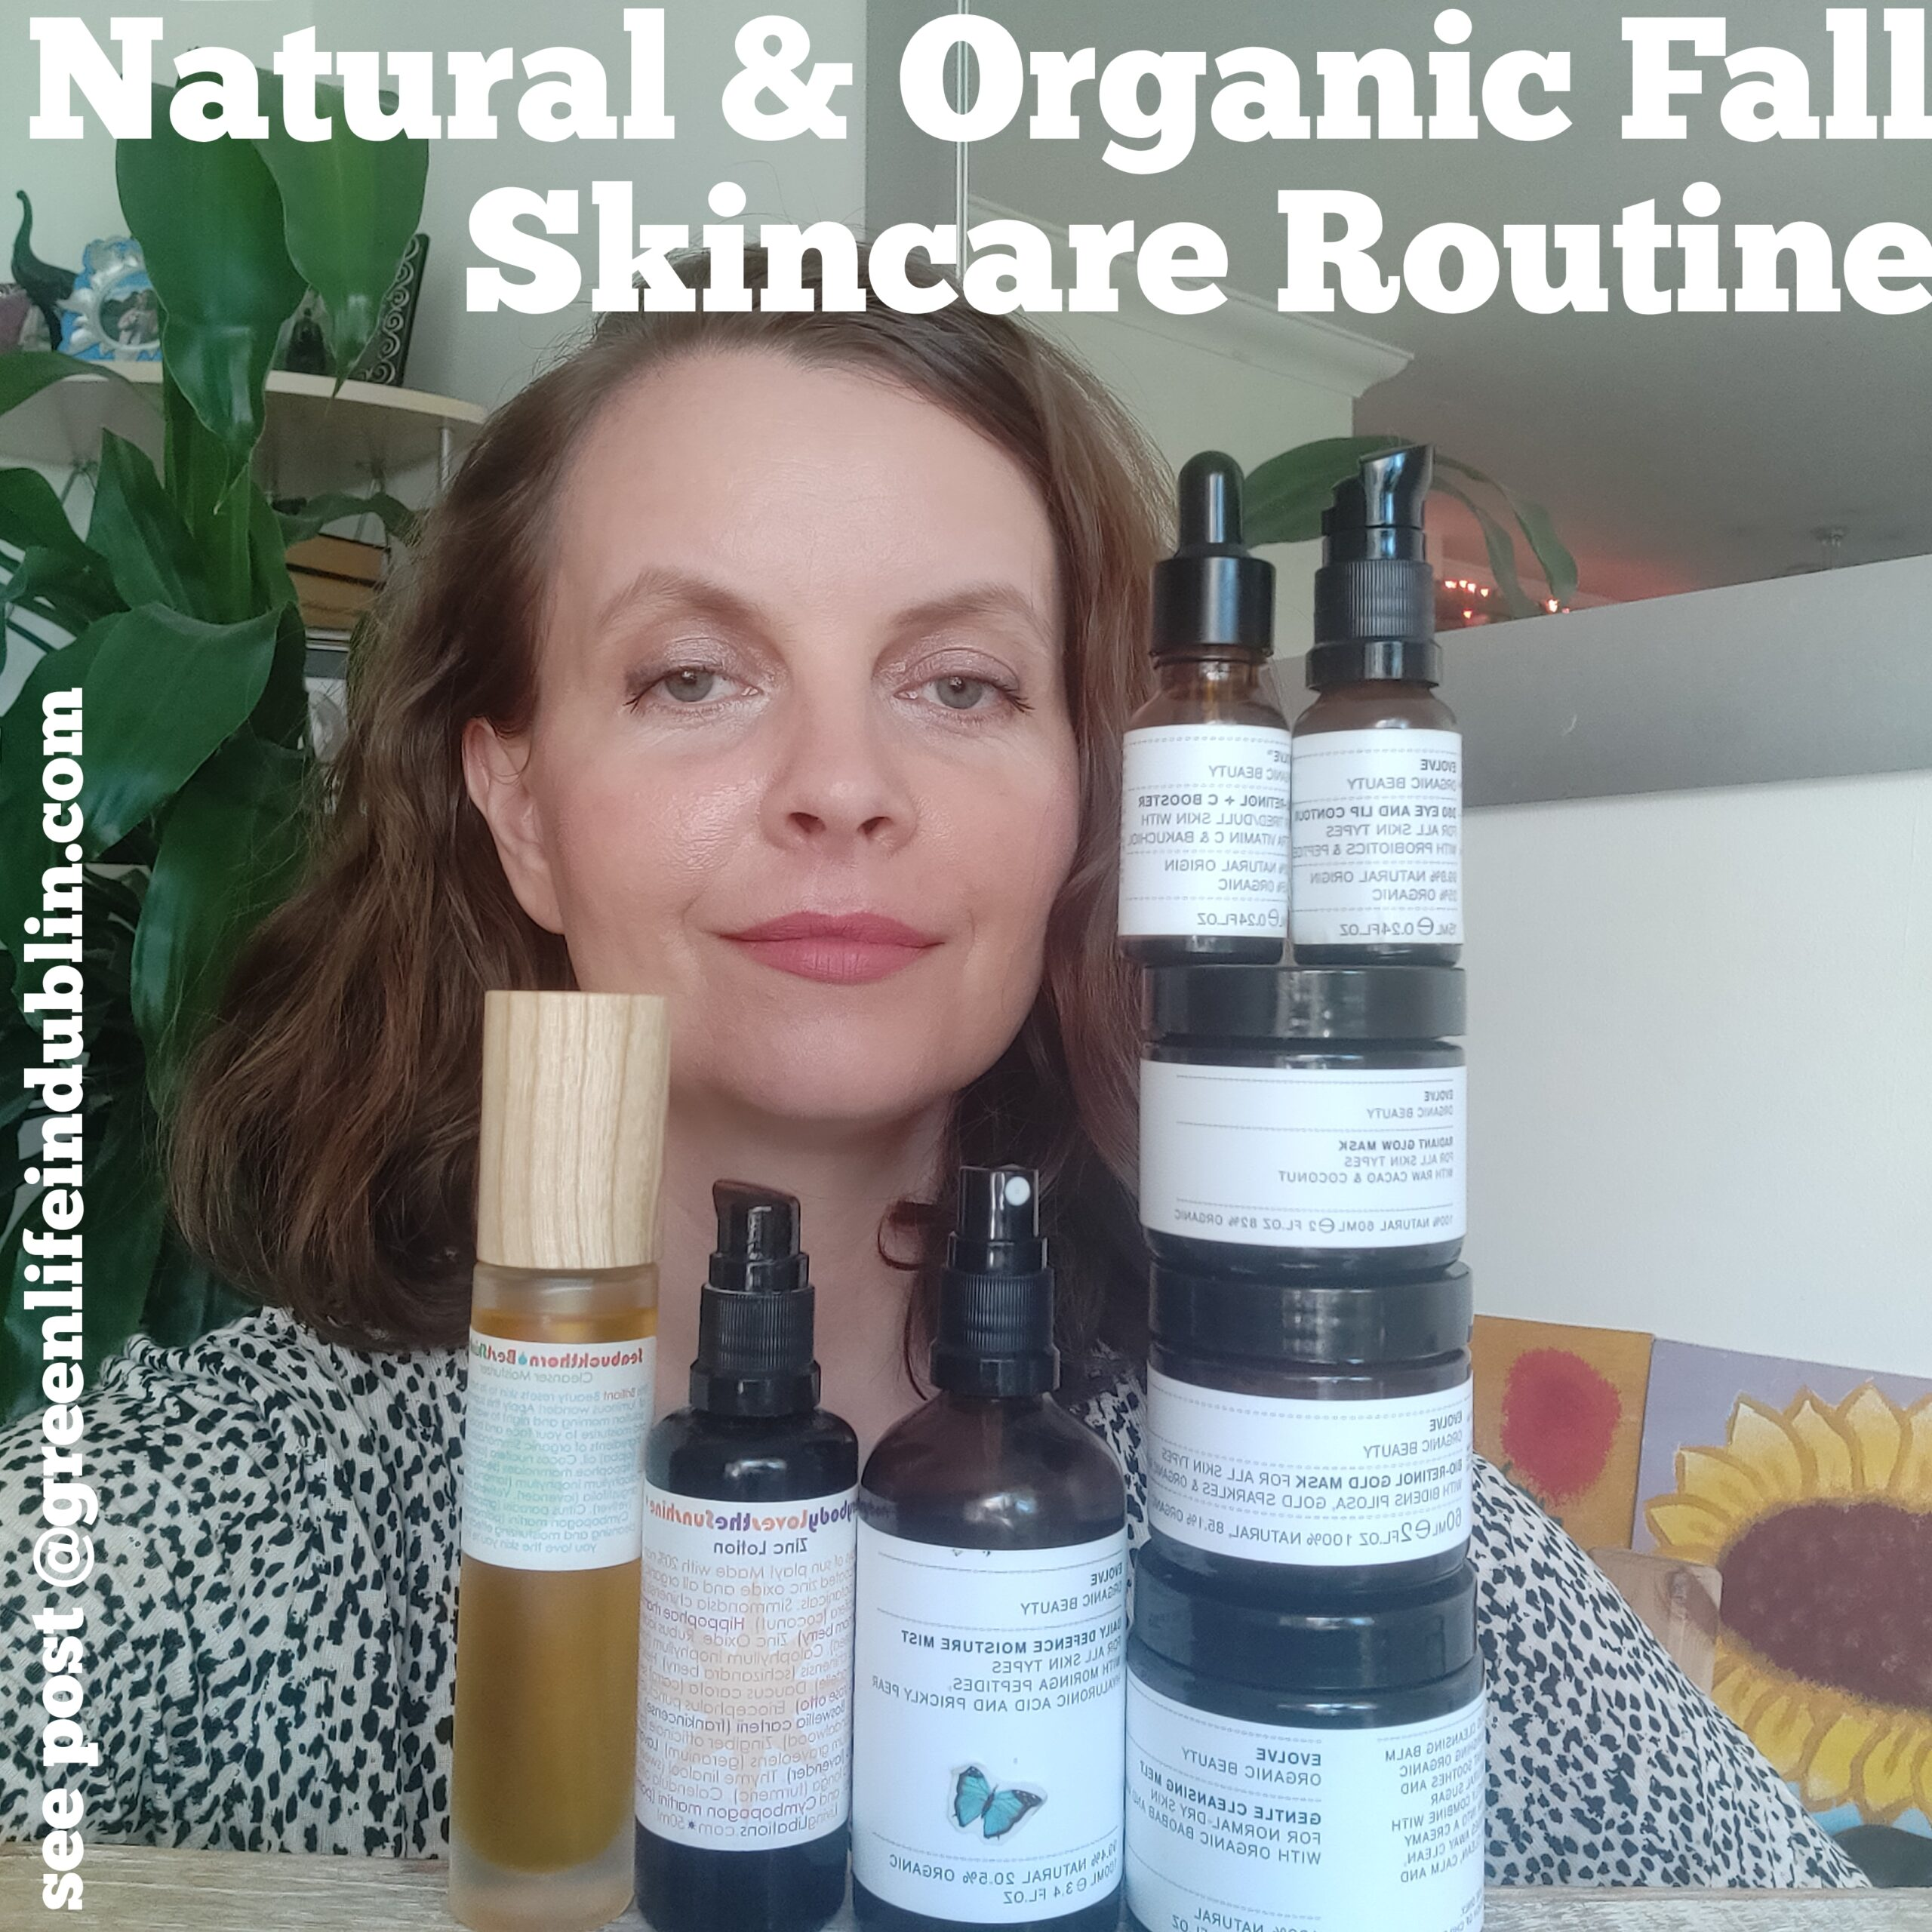 My Natural & Organic Fall Skincare Routine - Evolve Organic Beauty, Living Libations, Alteya Organics, Khadi & More